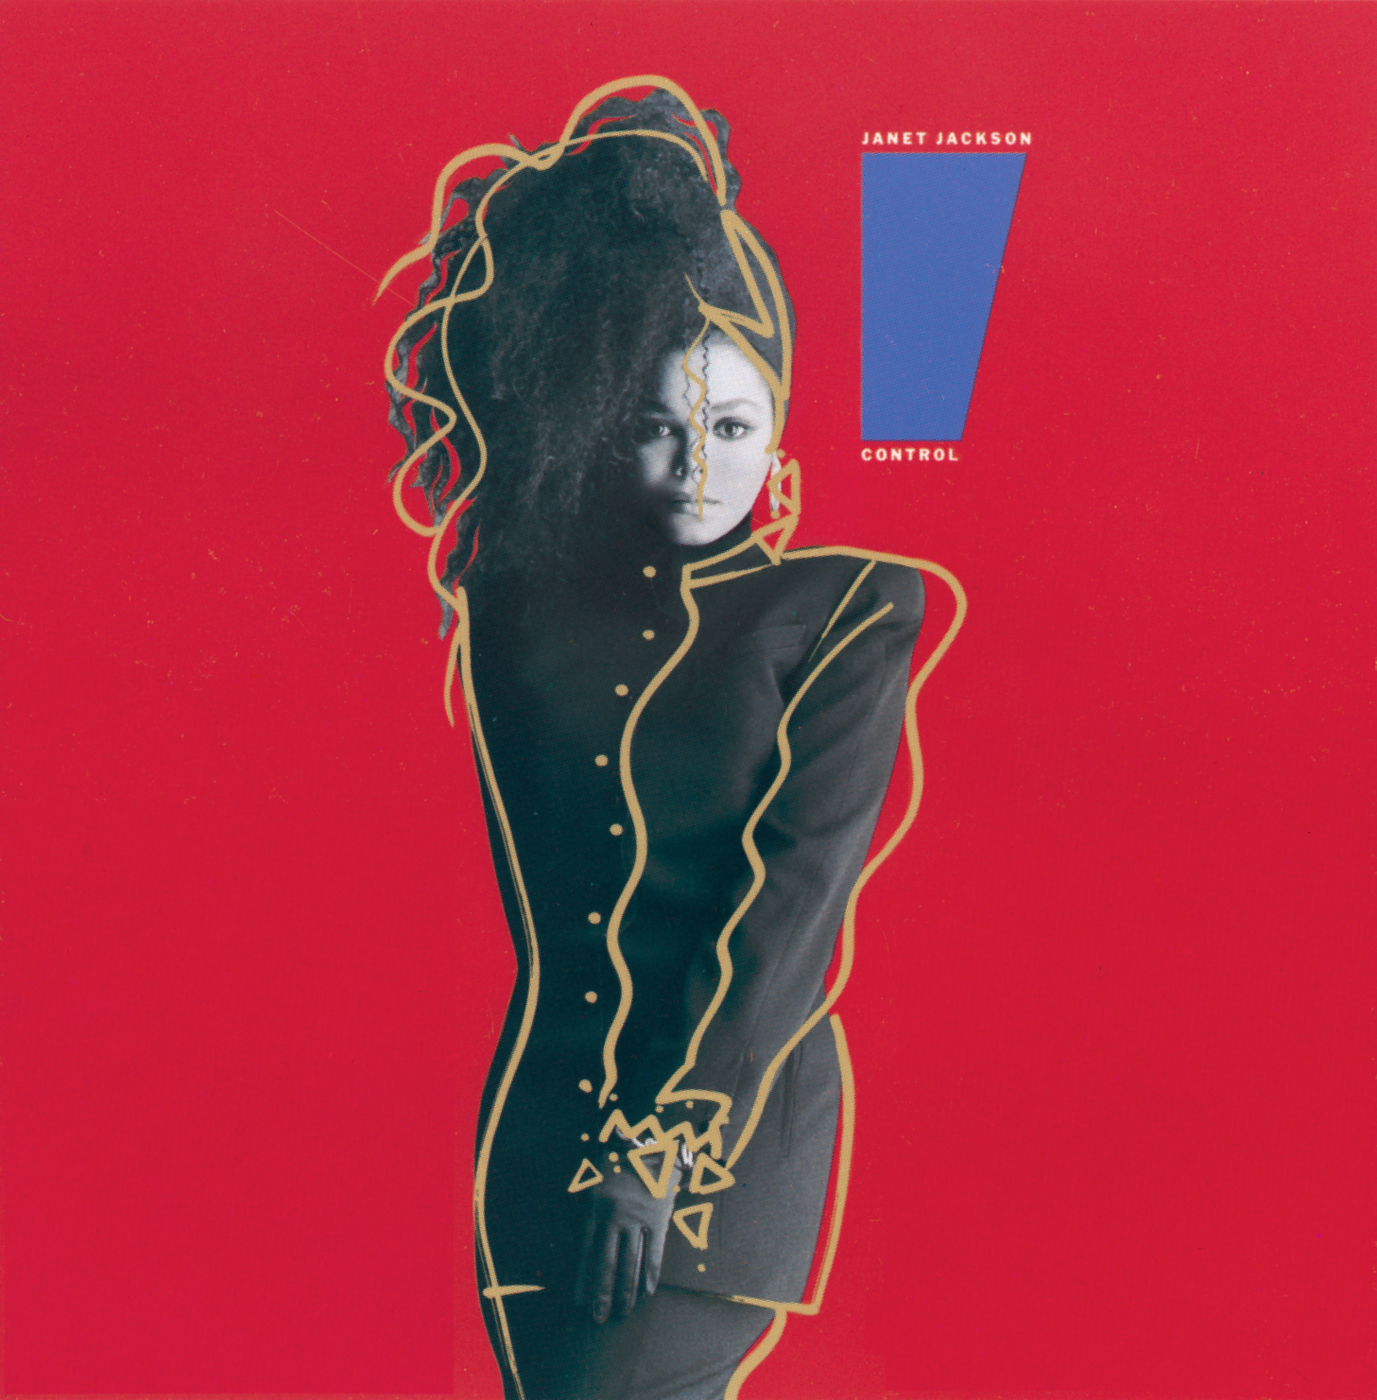 Listen Free to Janet Jackson - Control Radio | iHeartRadio